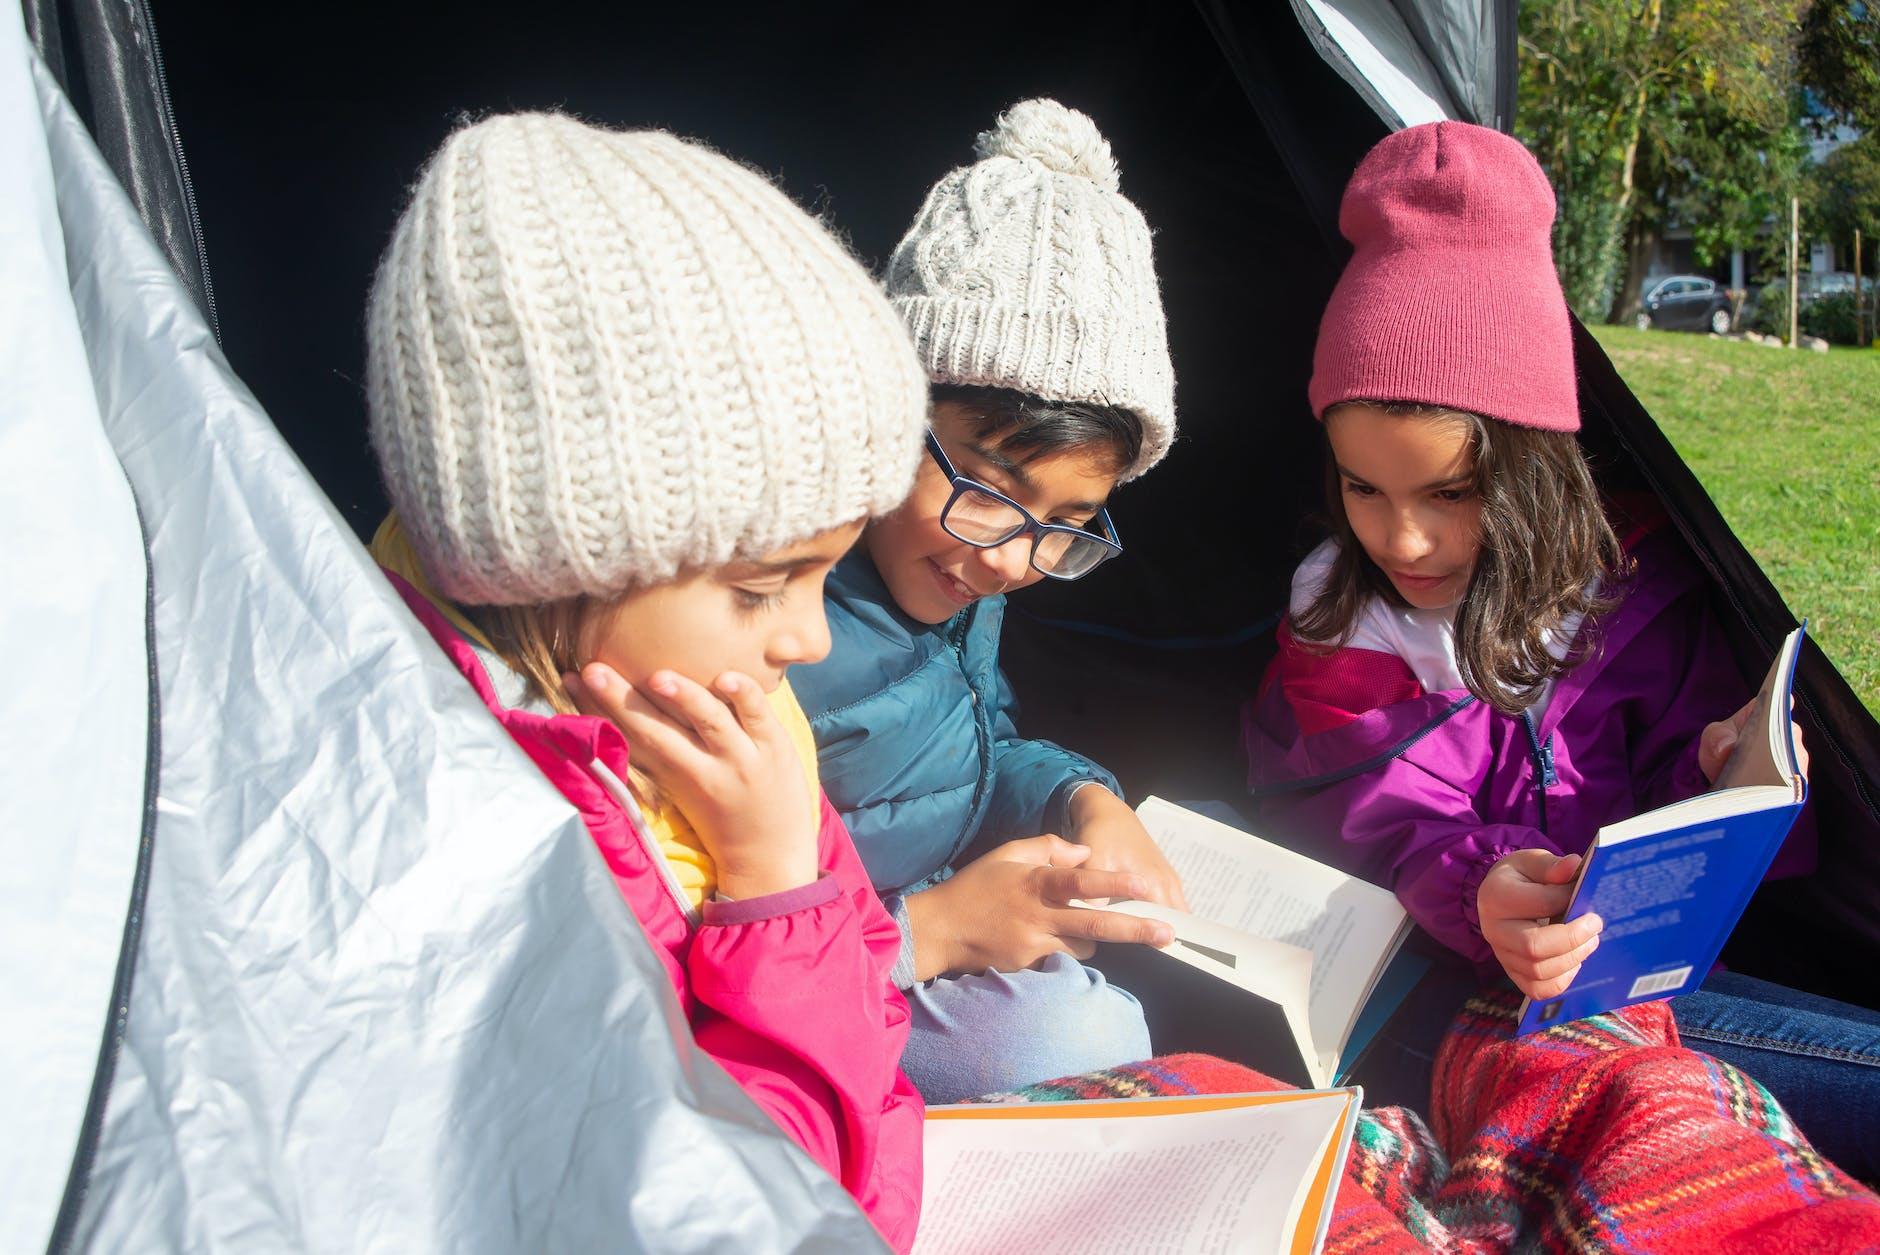 Children mingling at winter camp